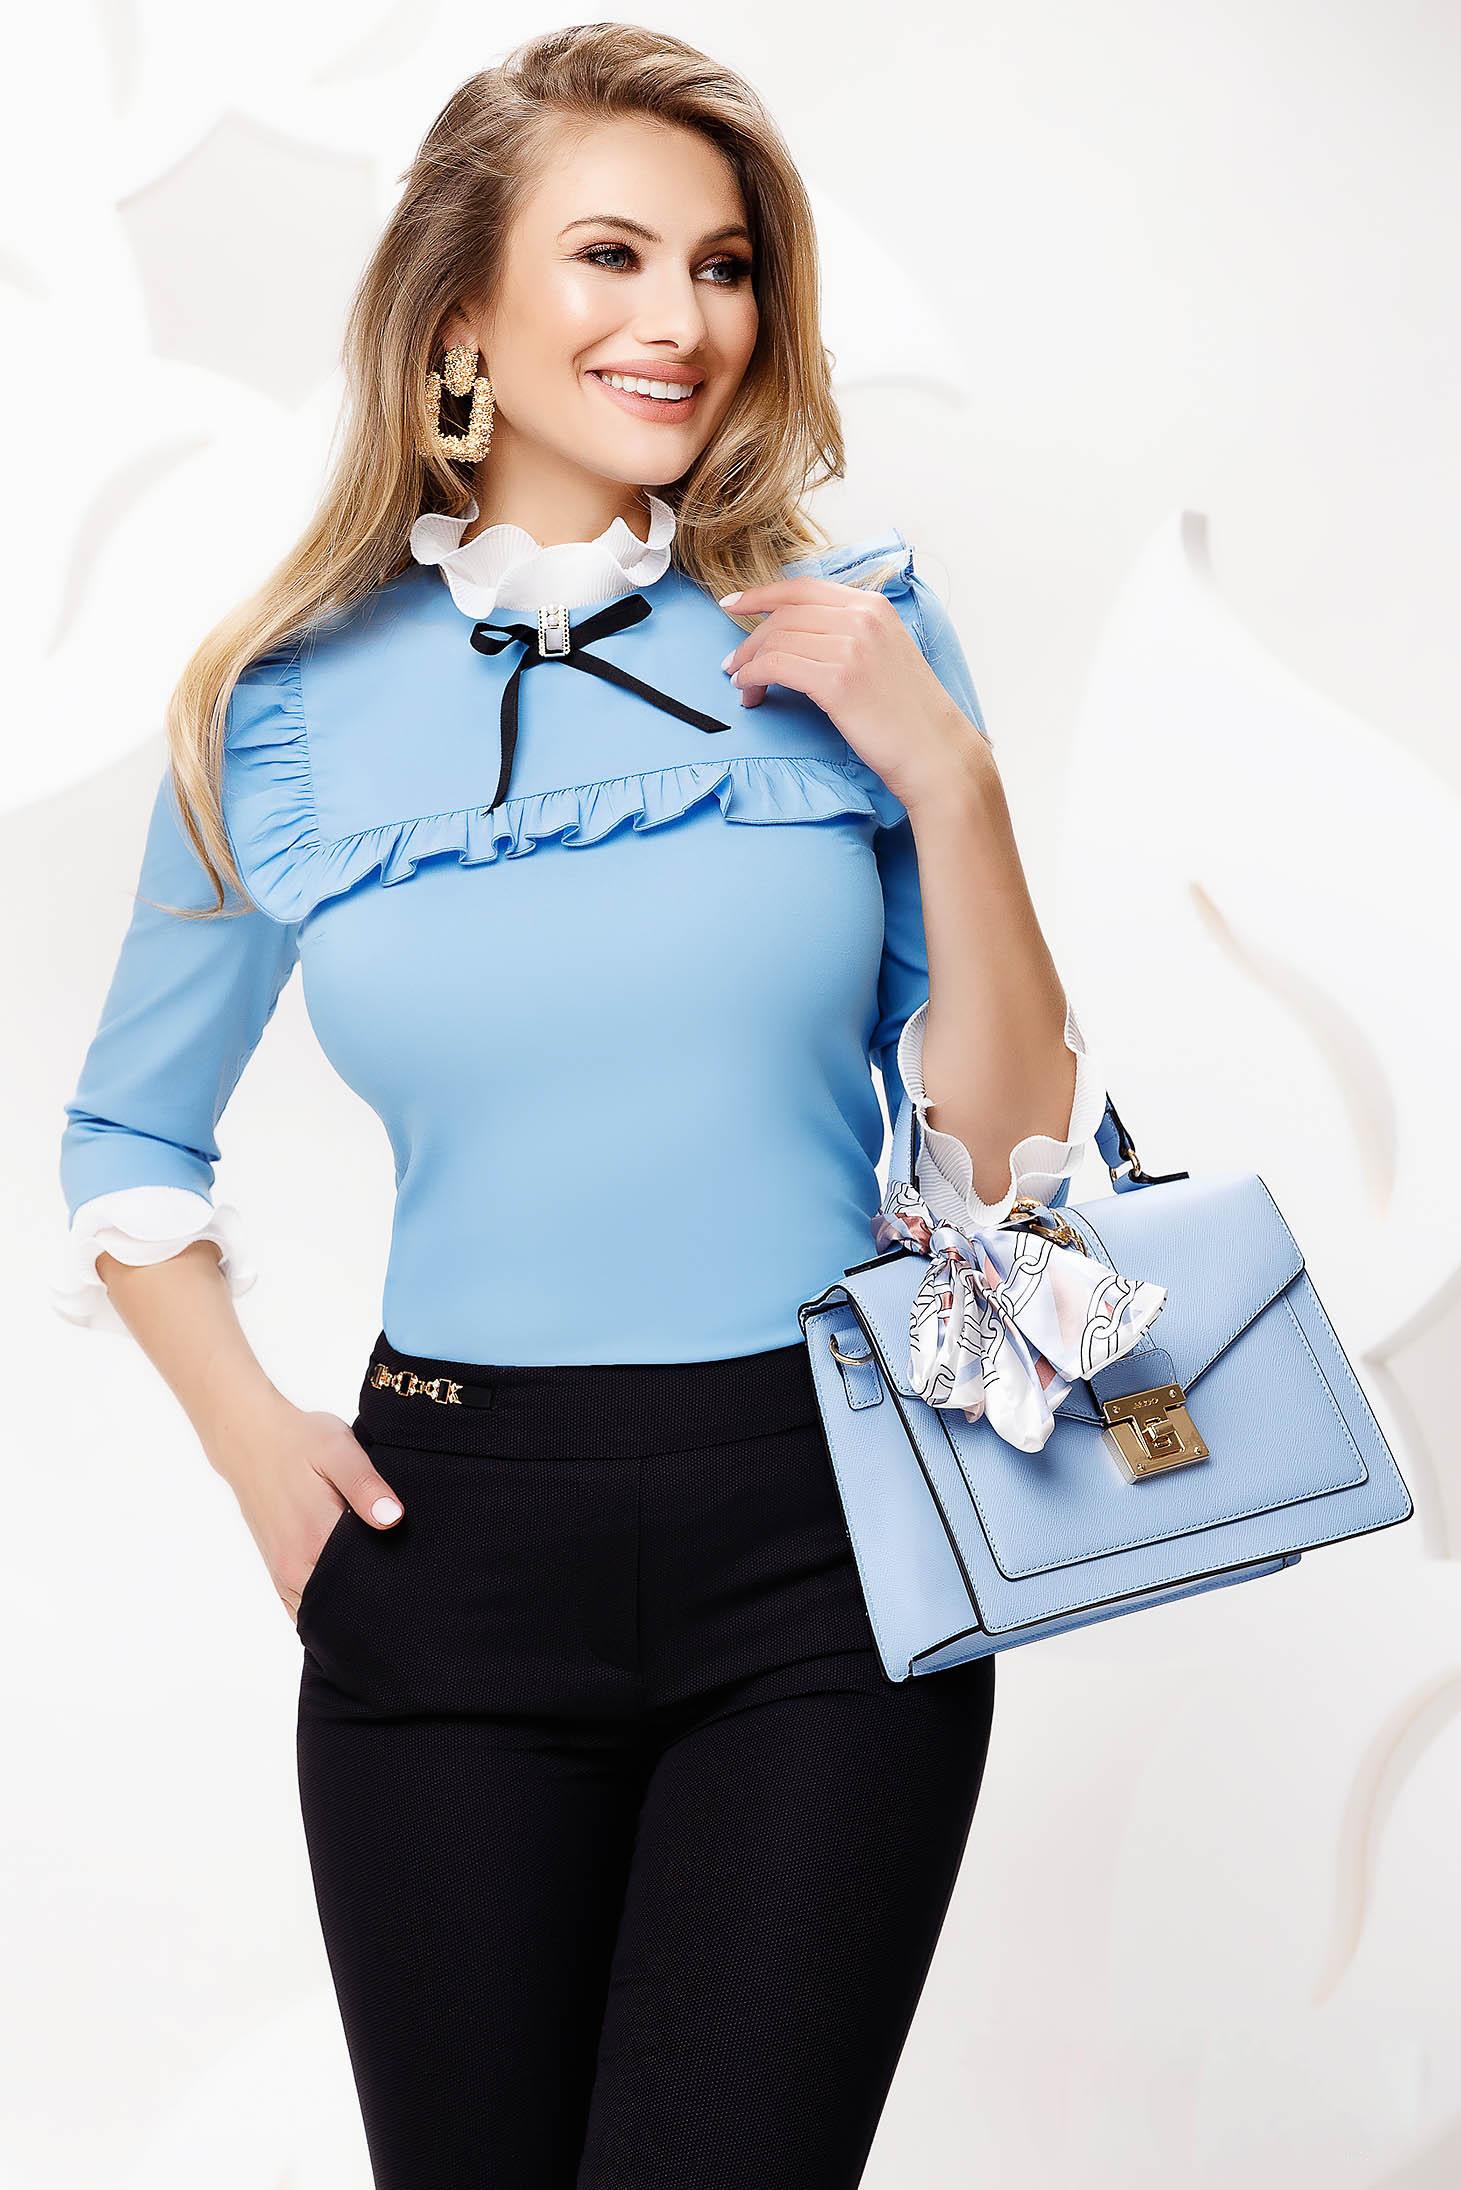 Camasa dama Fofy albastra-deschis office cambrata din material usor elastic accesorizata cu fundite si volanase